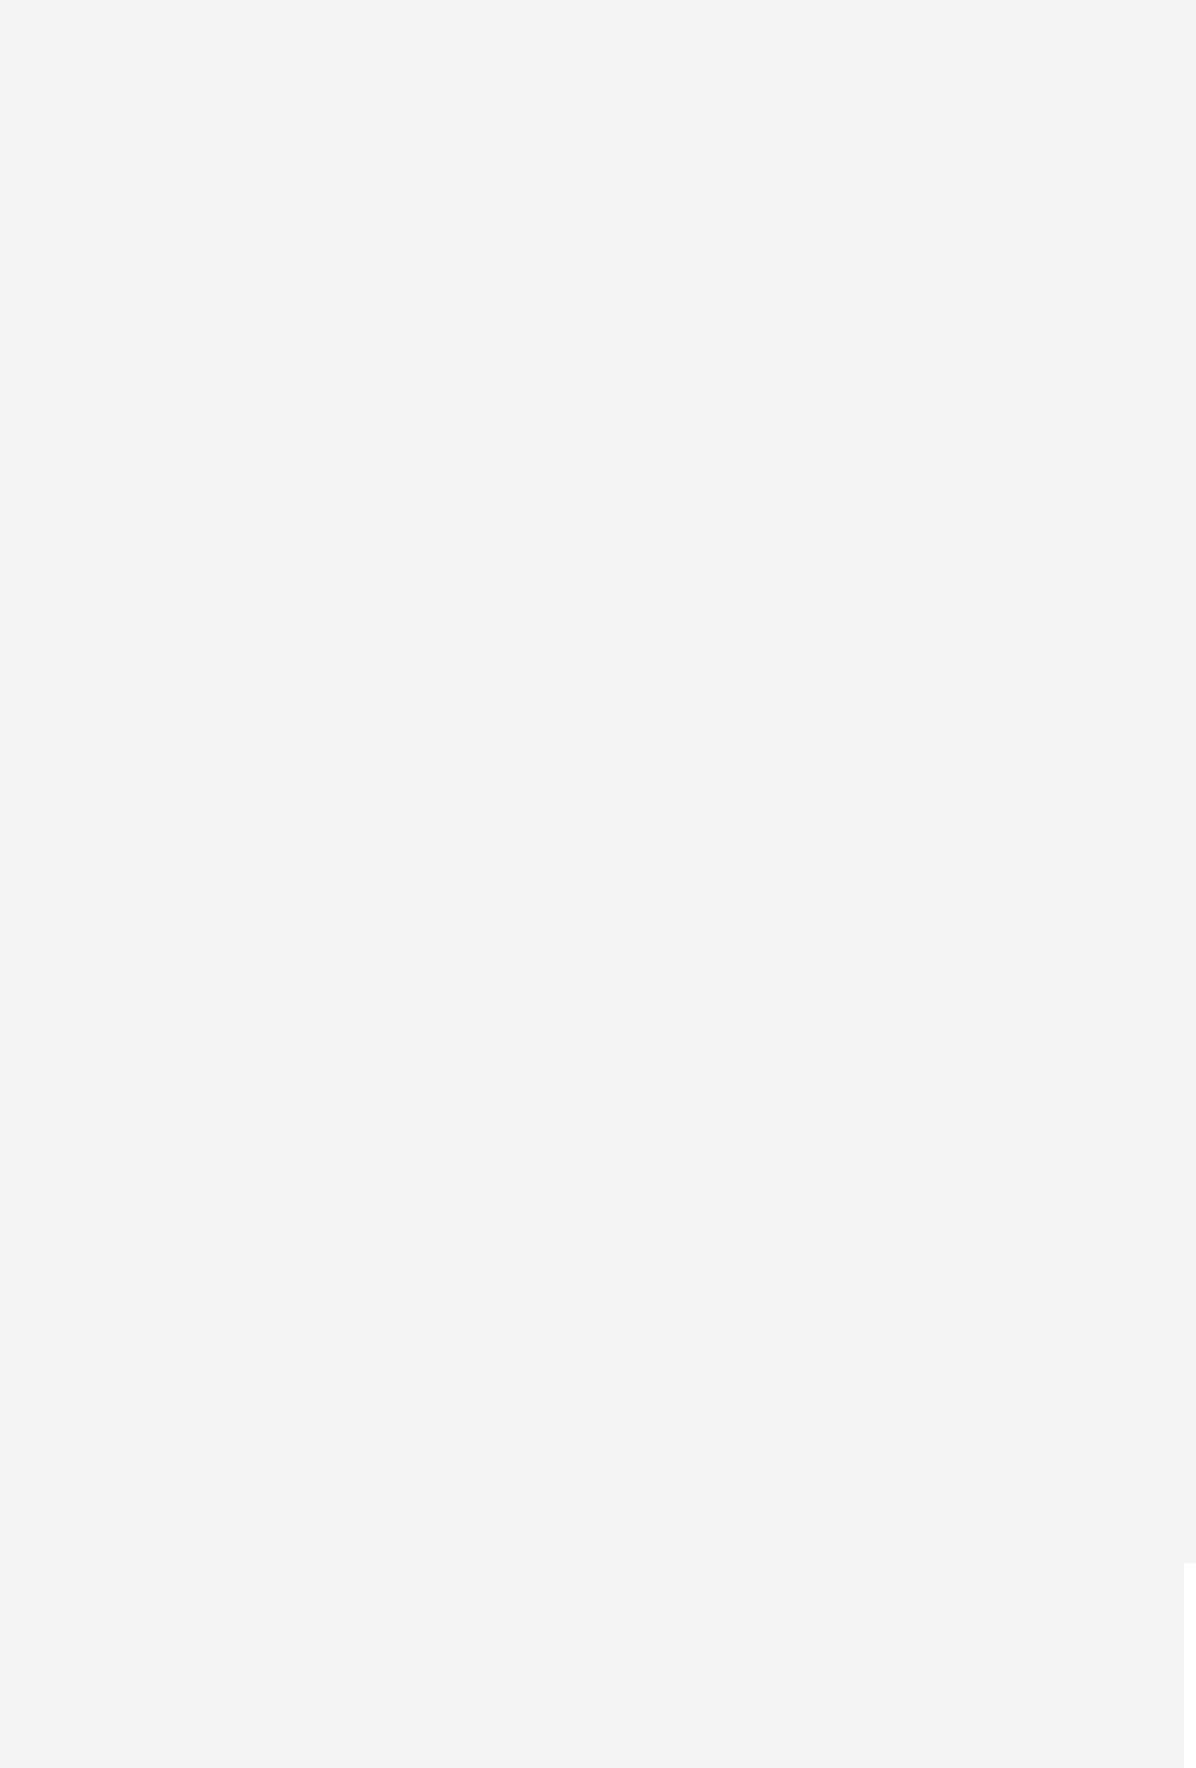 real food.png